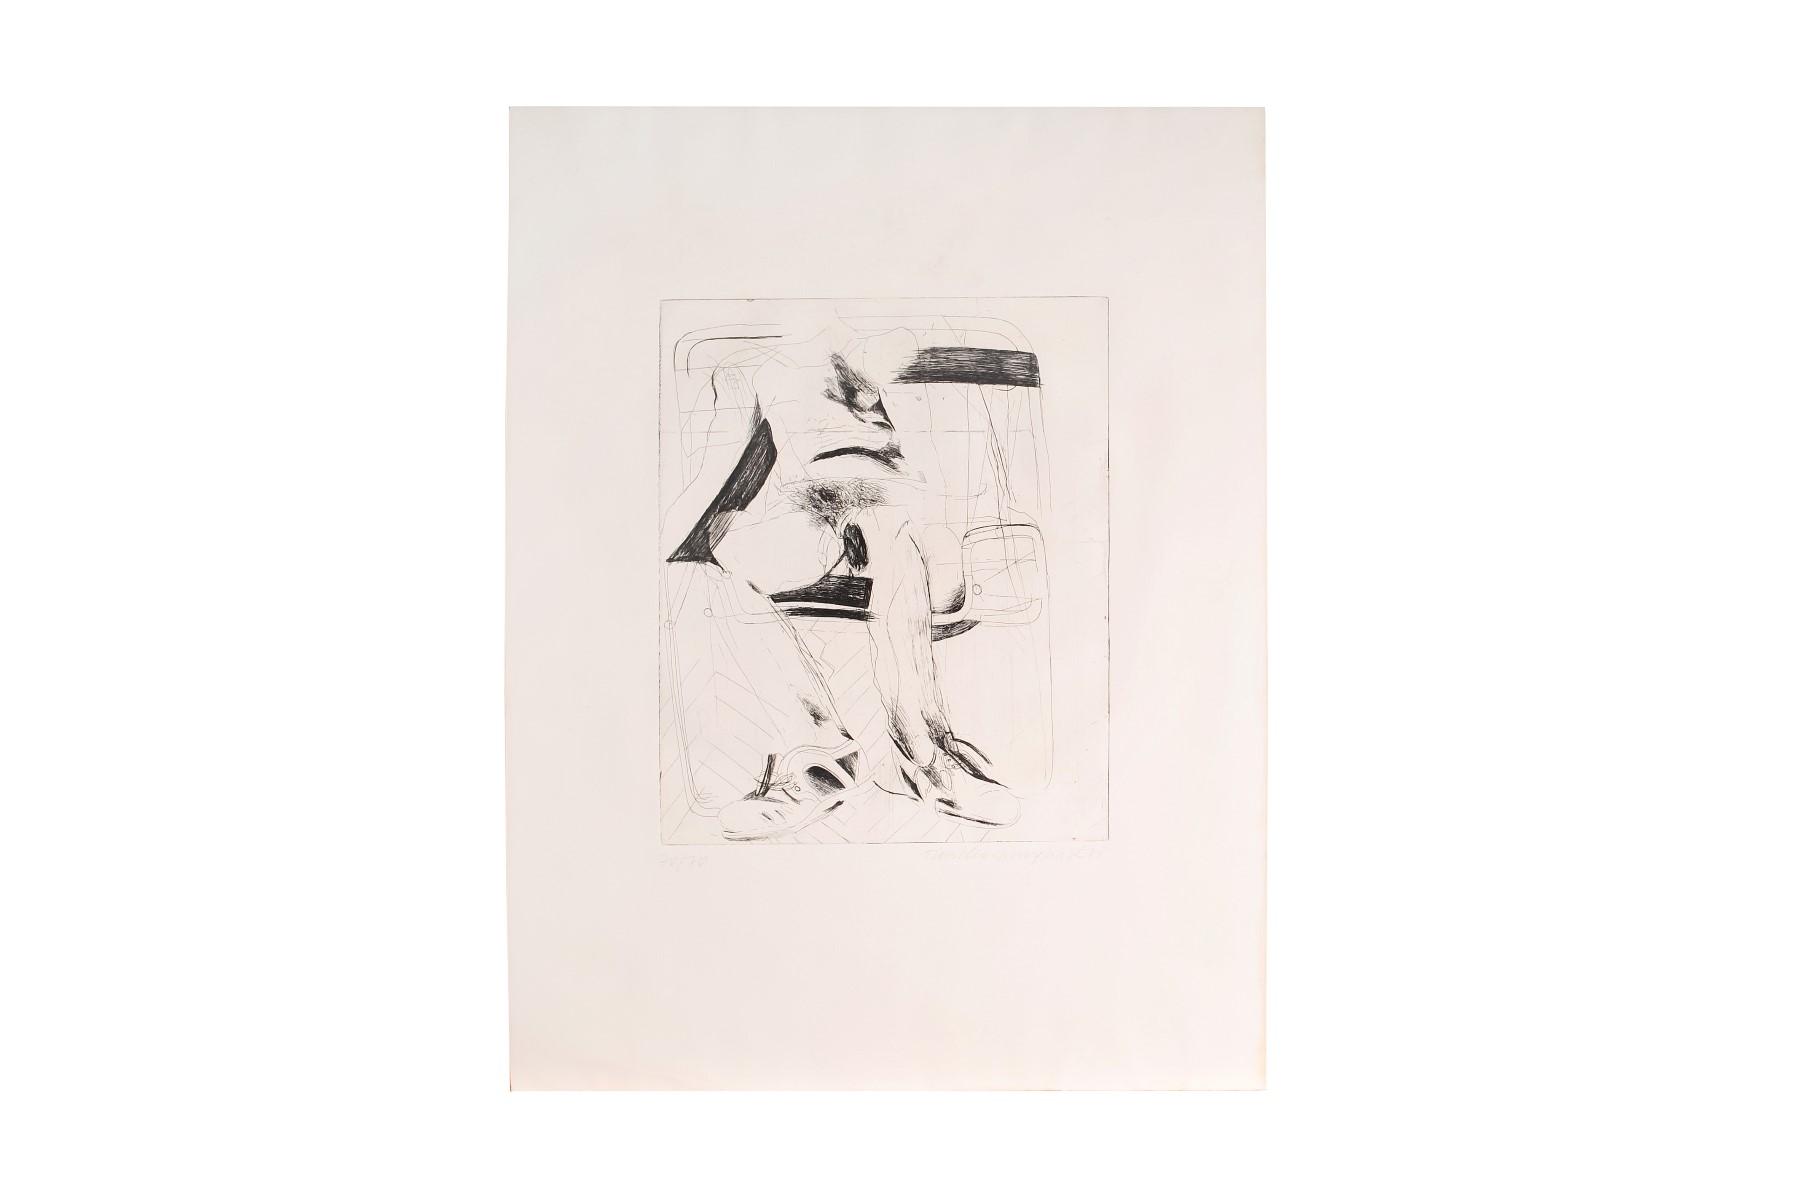 #25 Artist of the 20th Century, Figurative Composition   Künstler des 20. Jahrhundert, Figurative Komposition Image